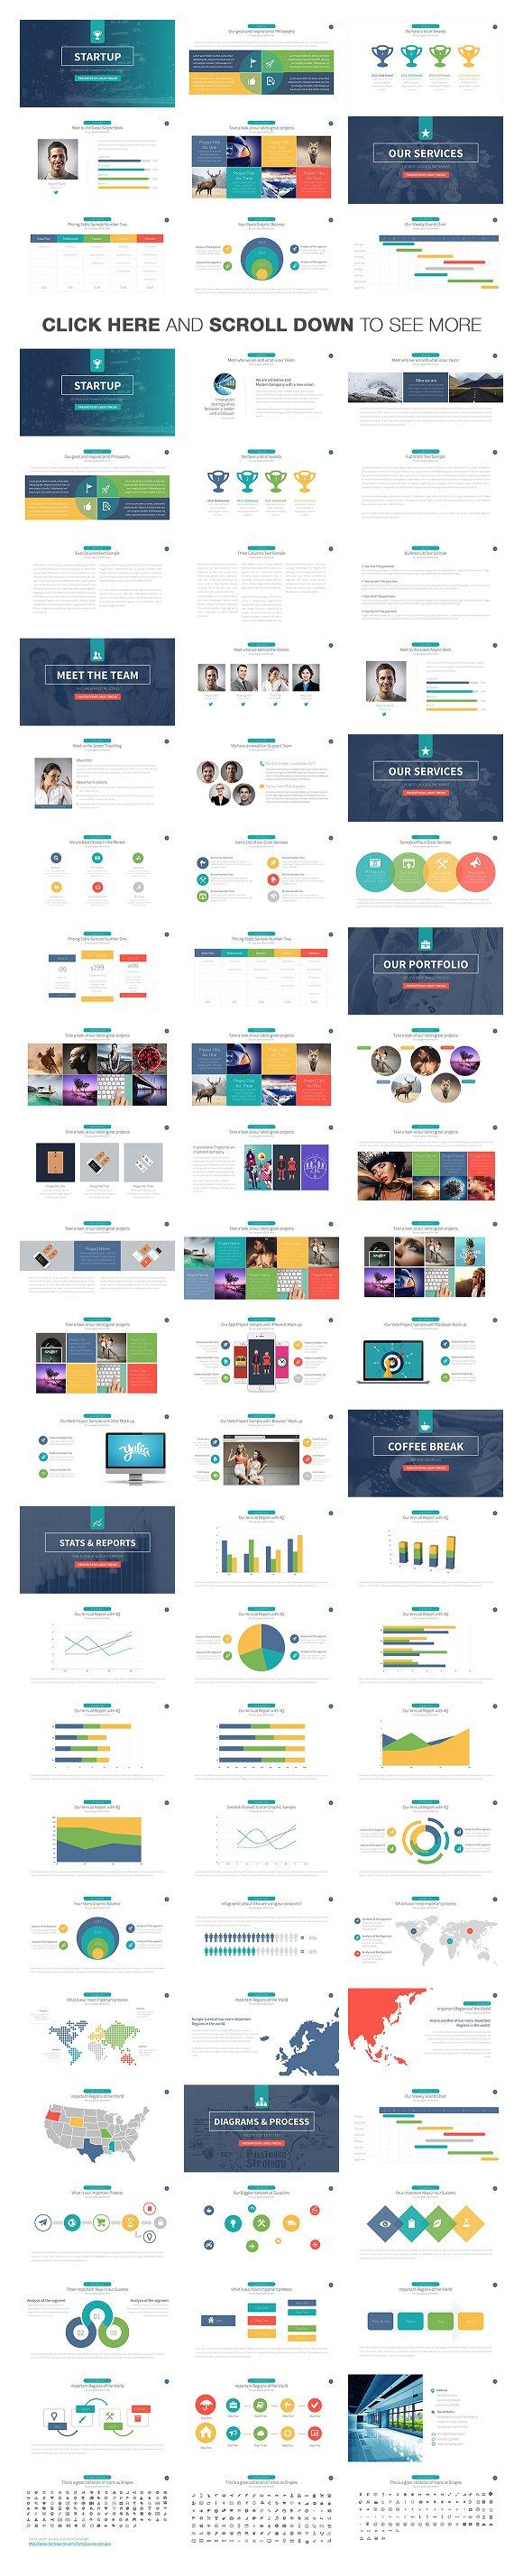 Startup powerpoint template presentation templates creative market toneelgroepblik Images